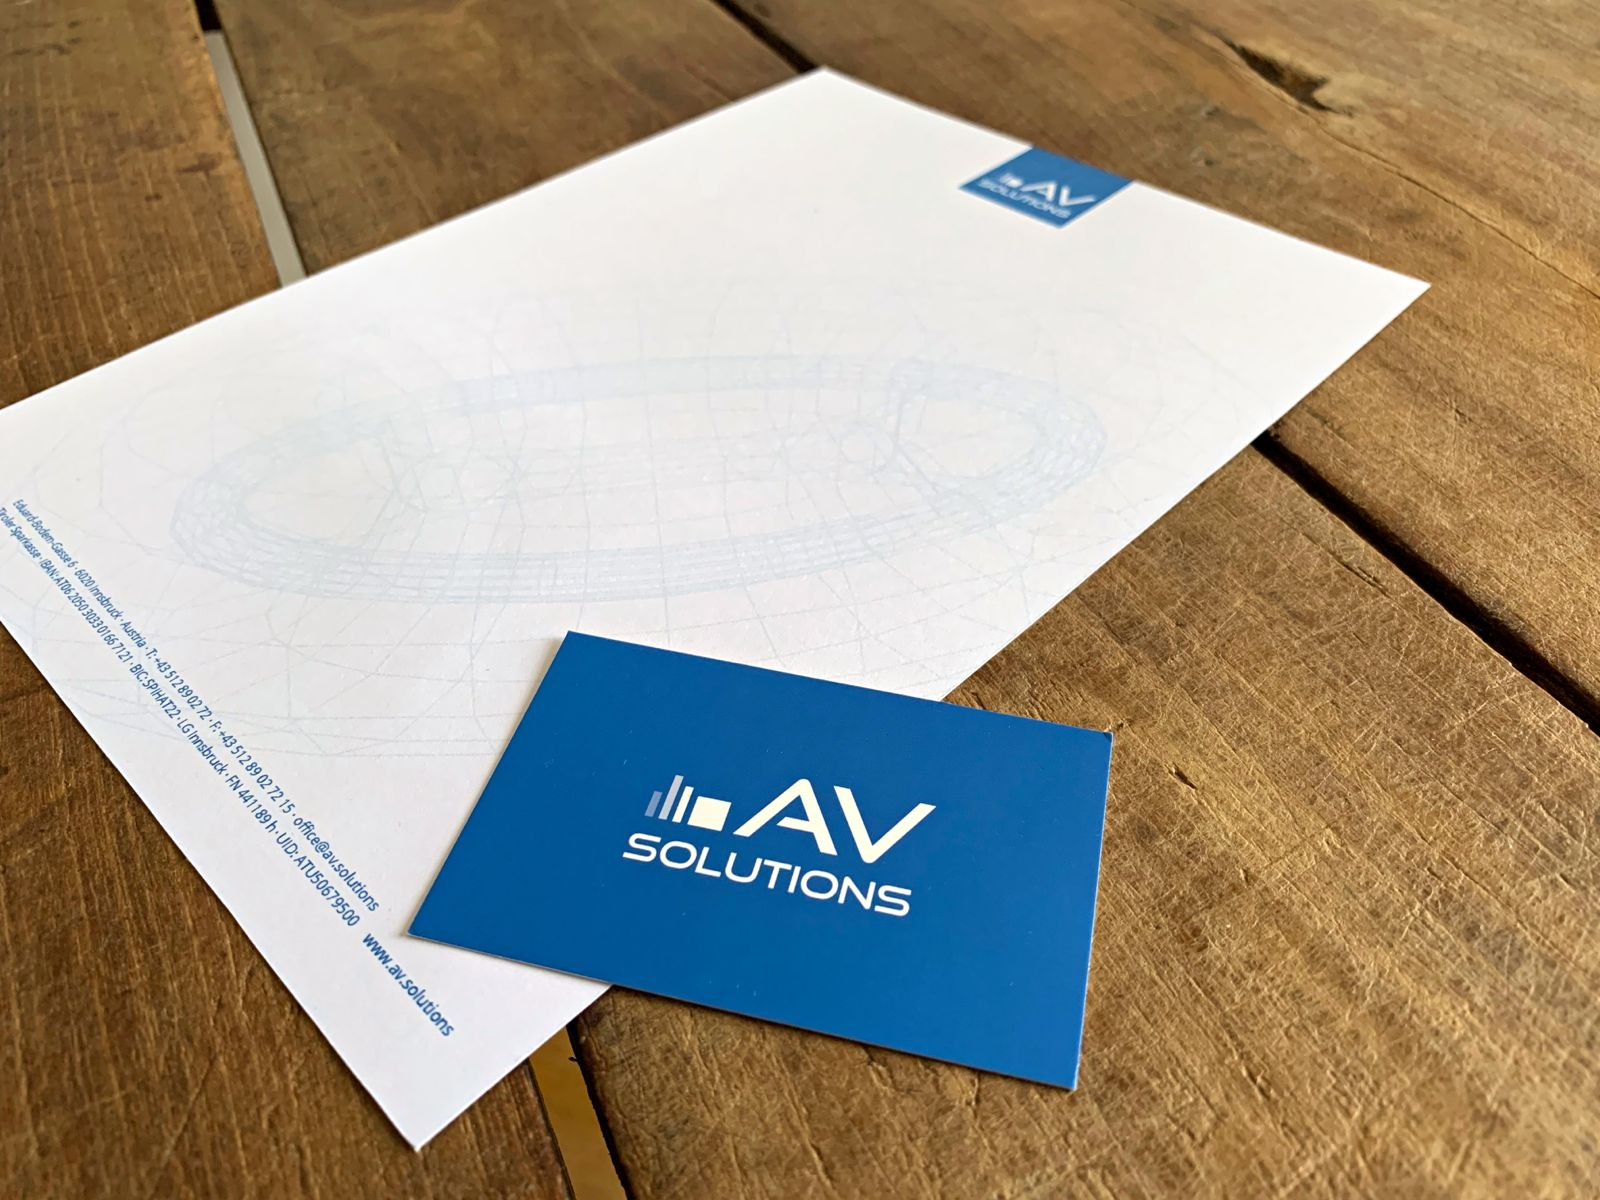 Corporate-Design-Drucksorten-AVsolutions-(c)-feinfein-10